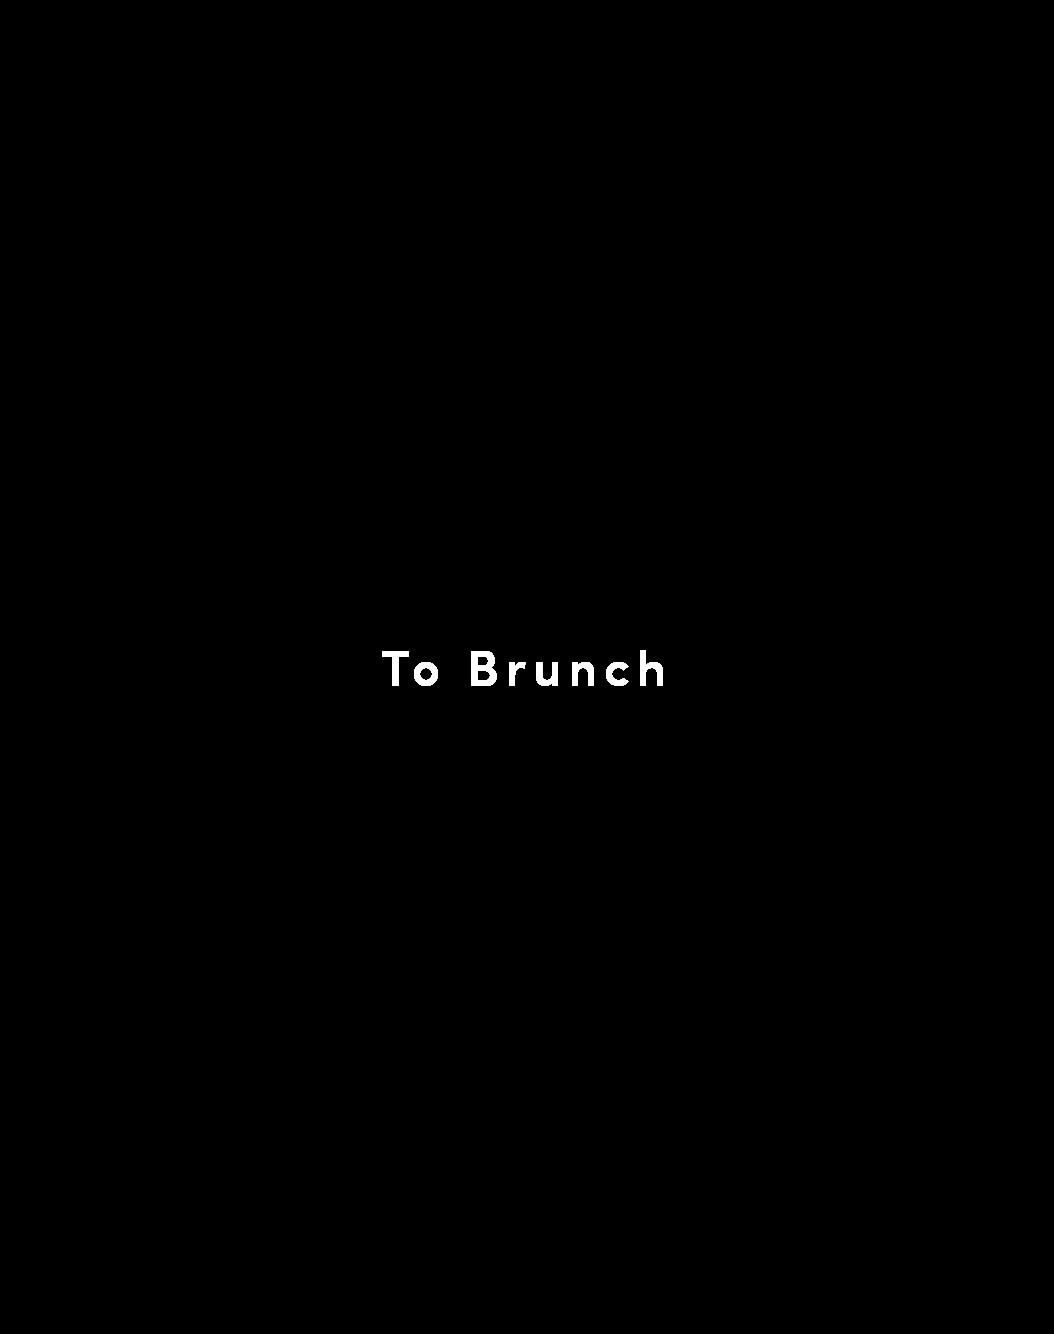 TO BRUNCH